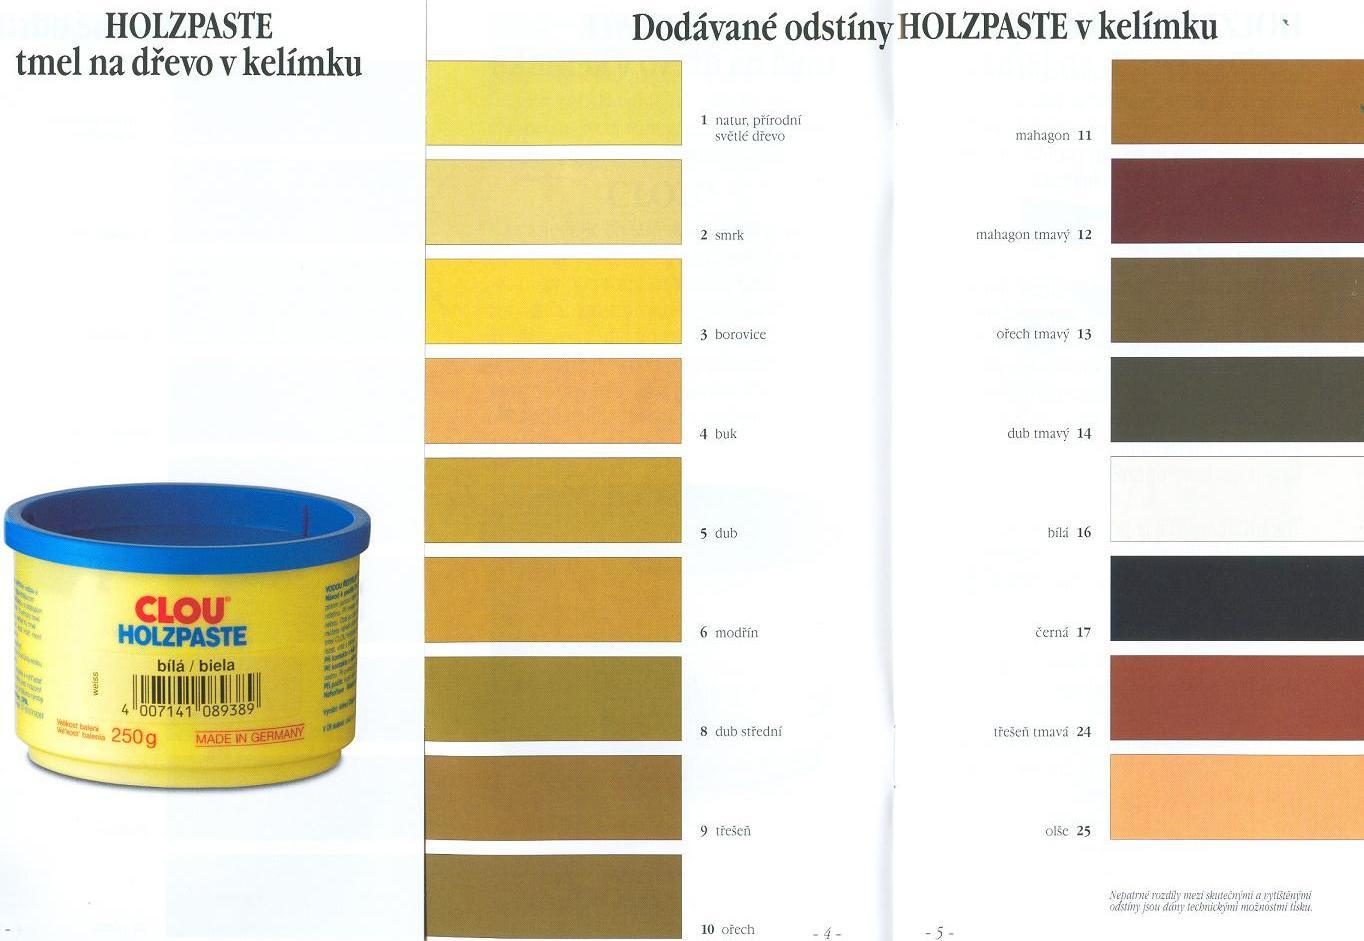 tmel clou holzpaste bílý 250 g   exkalibr.cz